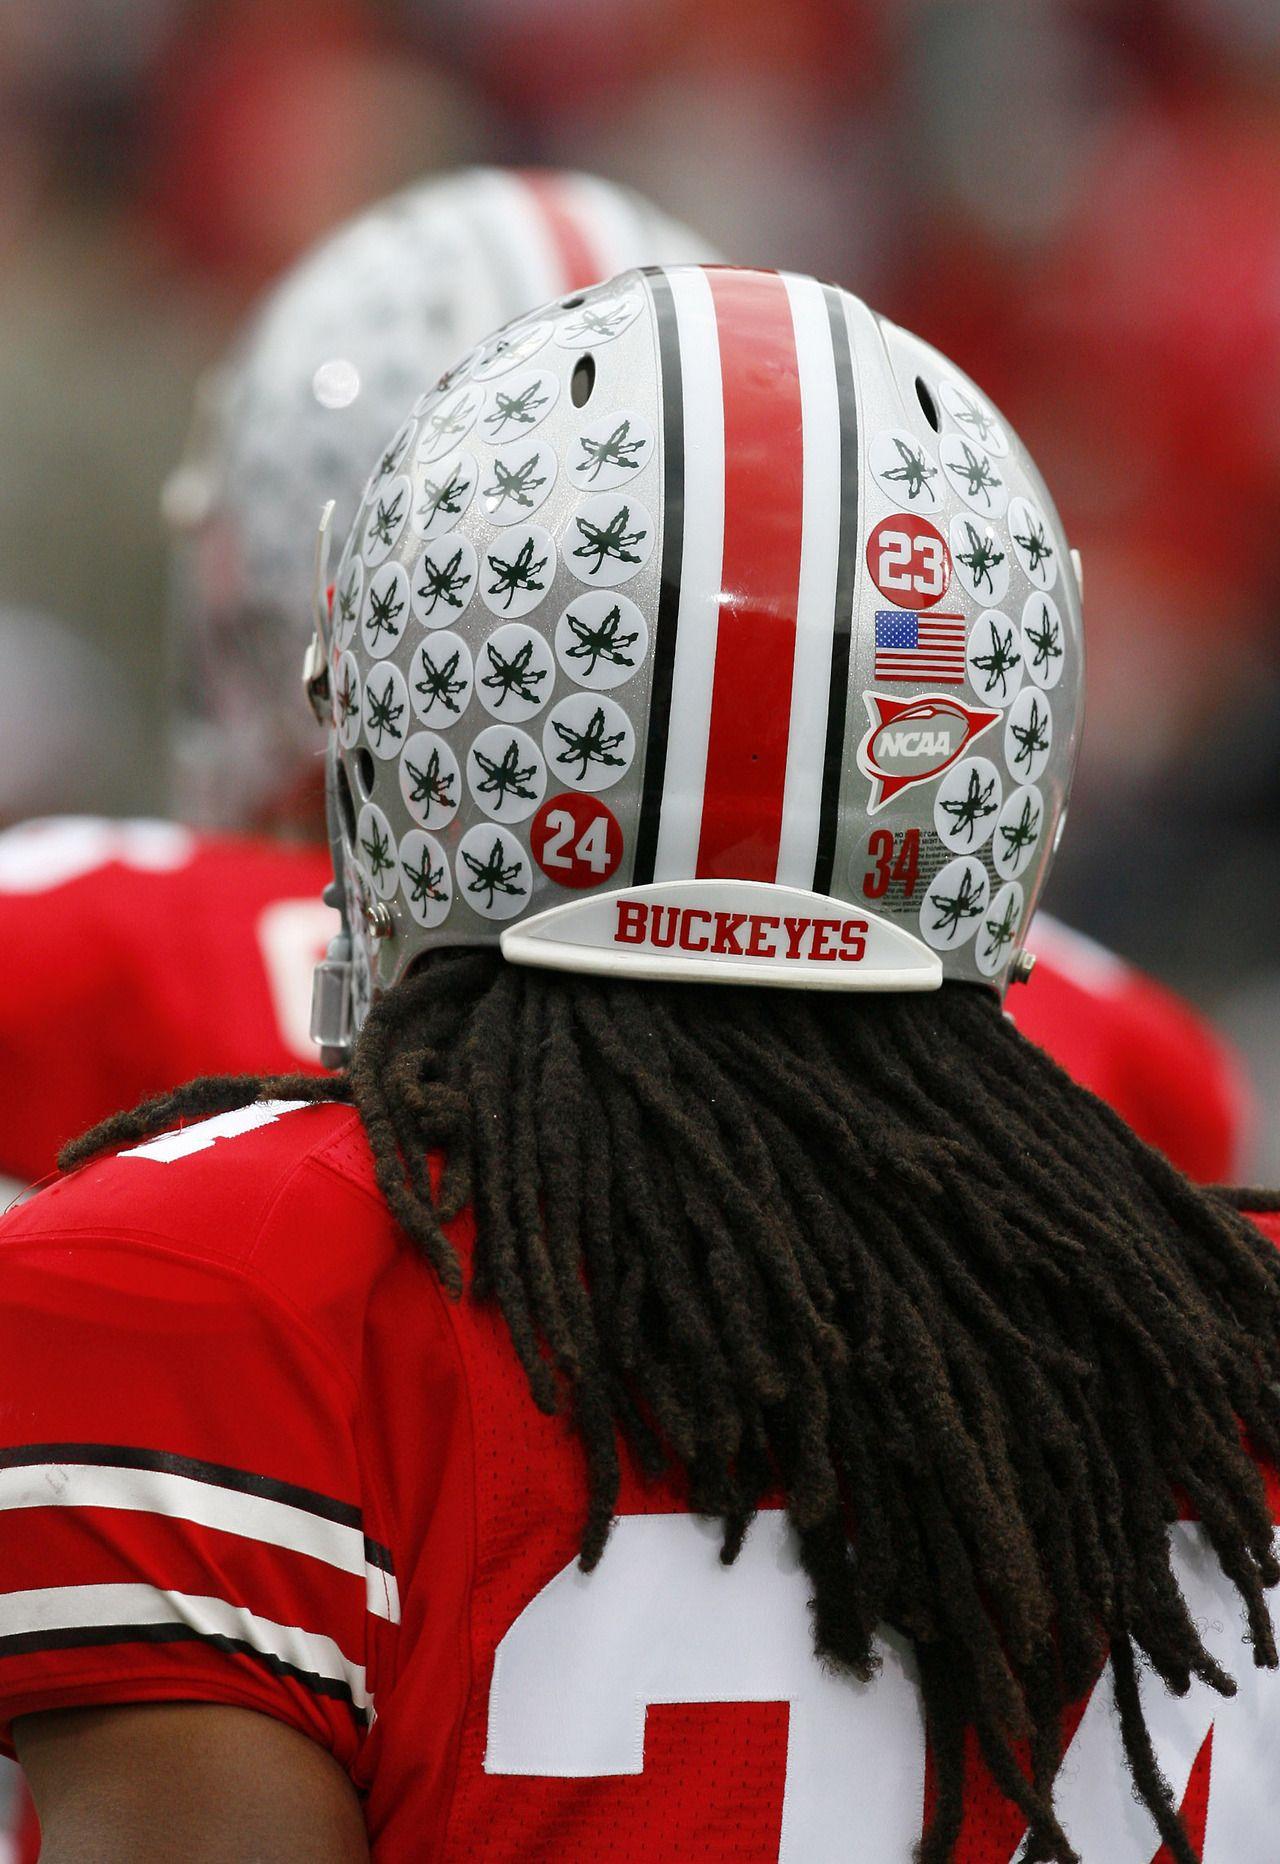 Buckeye helmets look legit once they have all the helmet